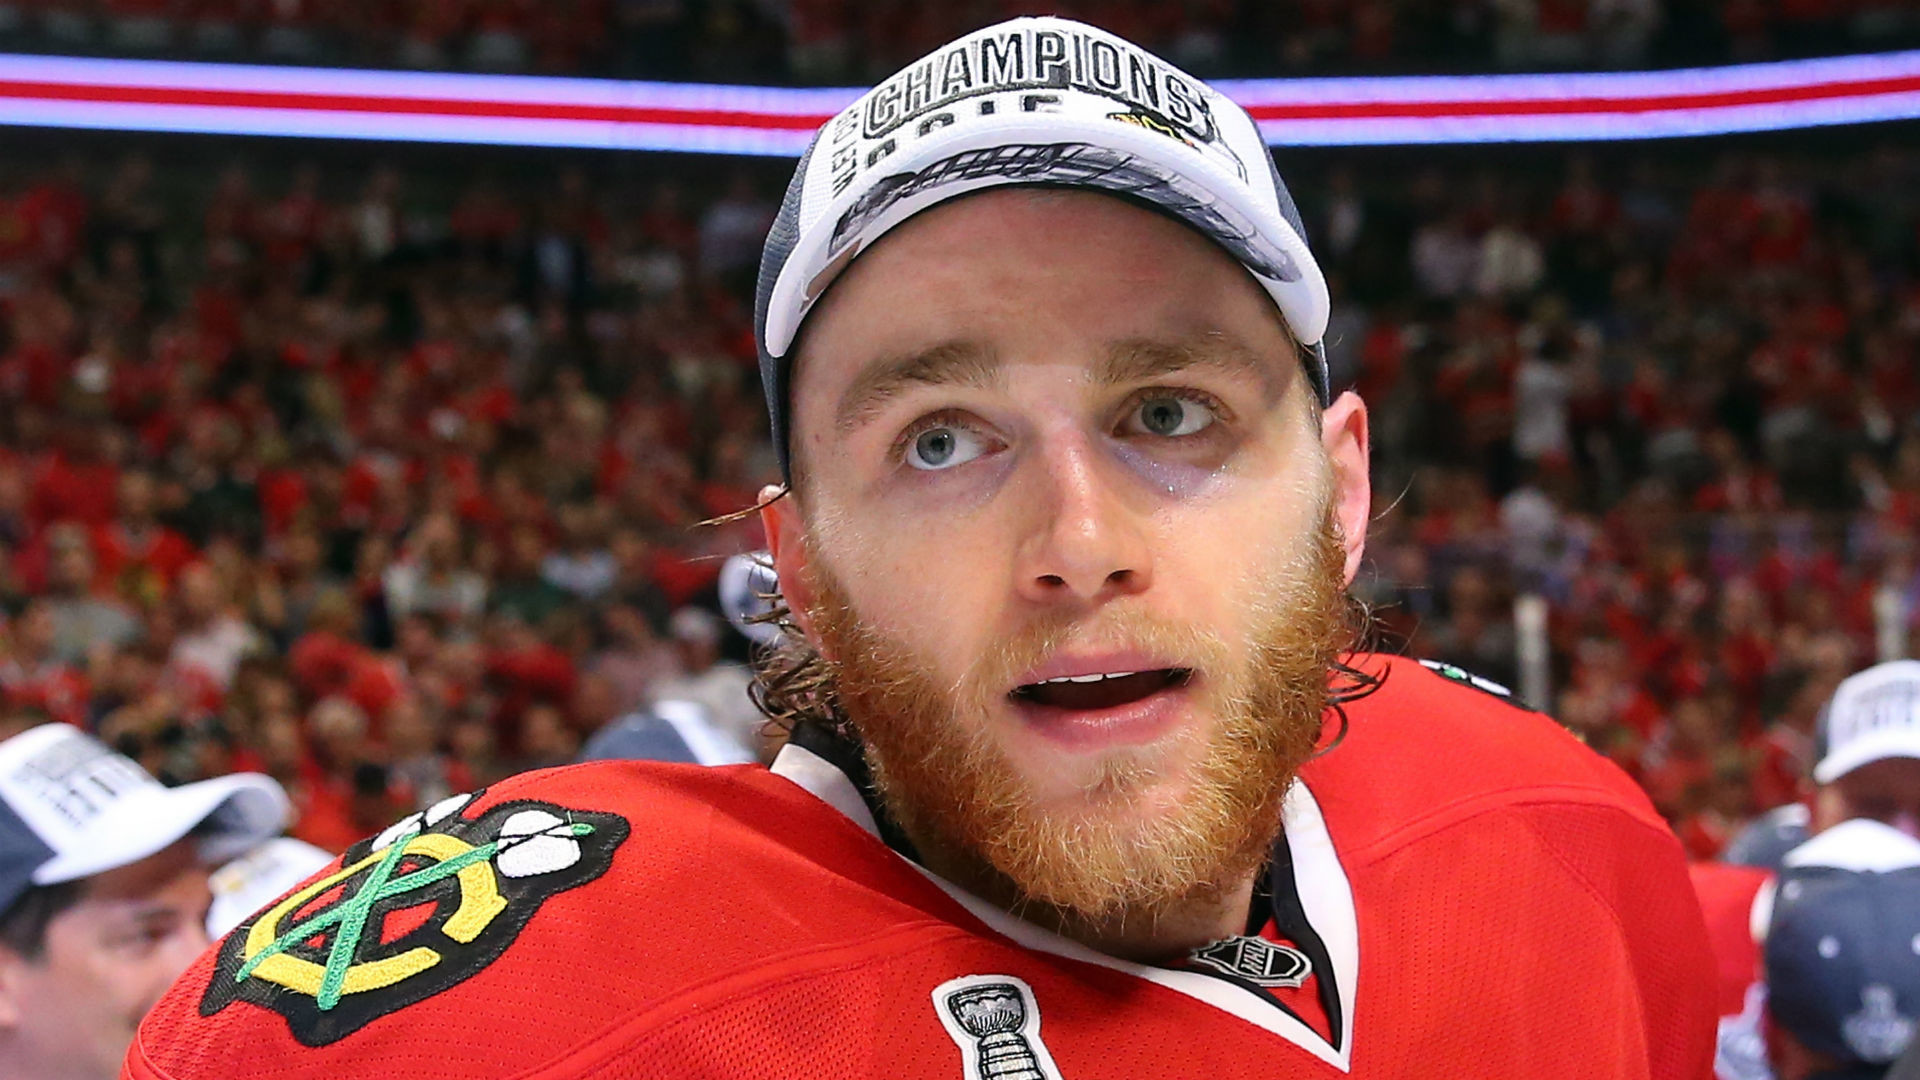 Blackhawks' Patrick Kane is subject of rape investigation, report says |  NHL | Sporting News